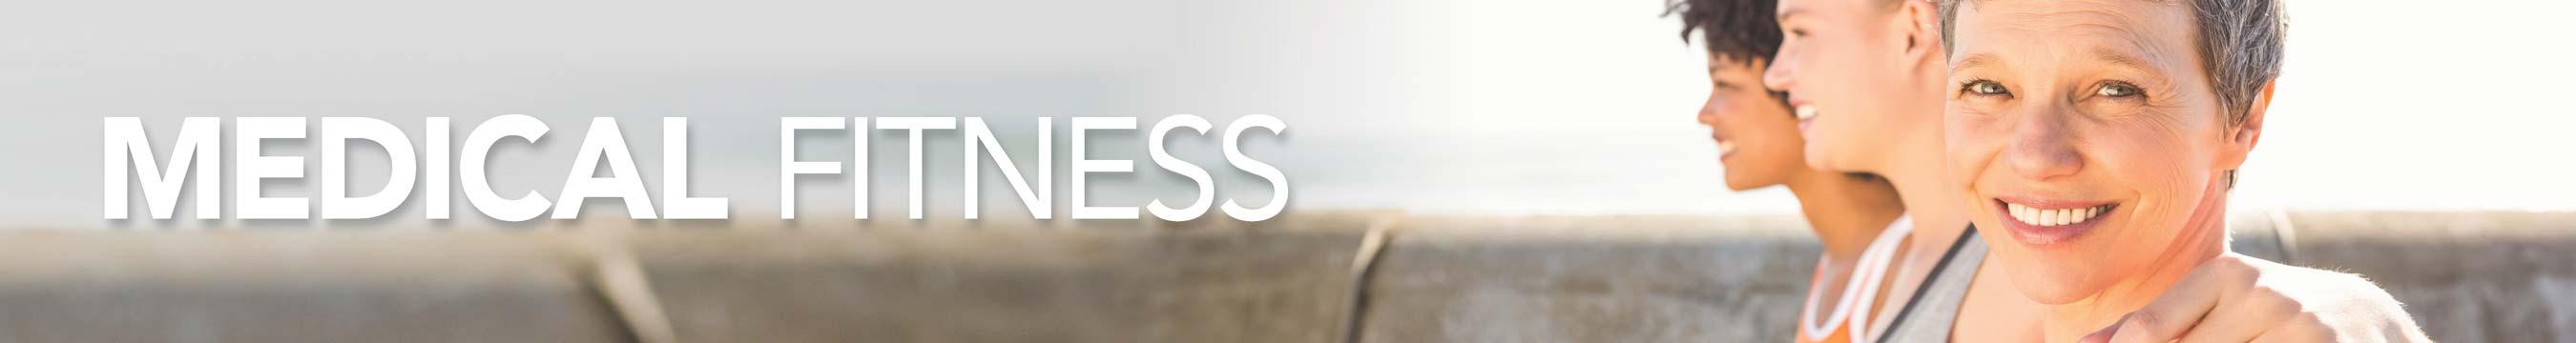 Active-Wellness-Medical-Fitness-02.jpg